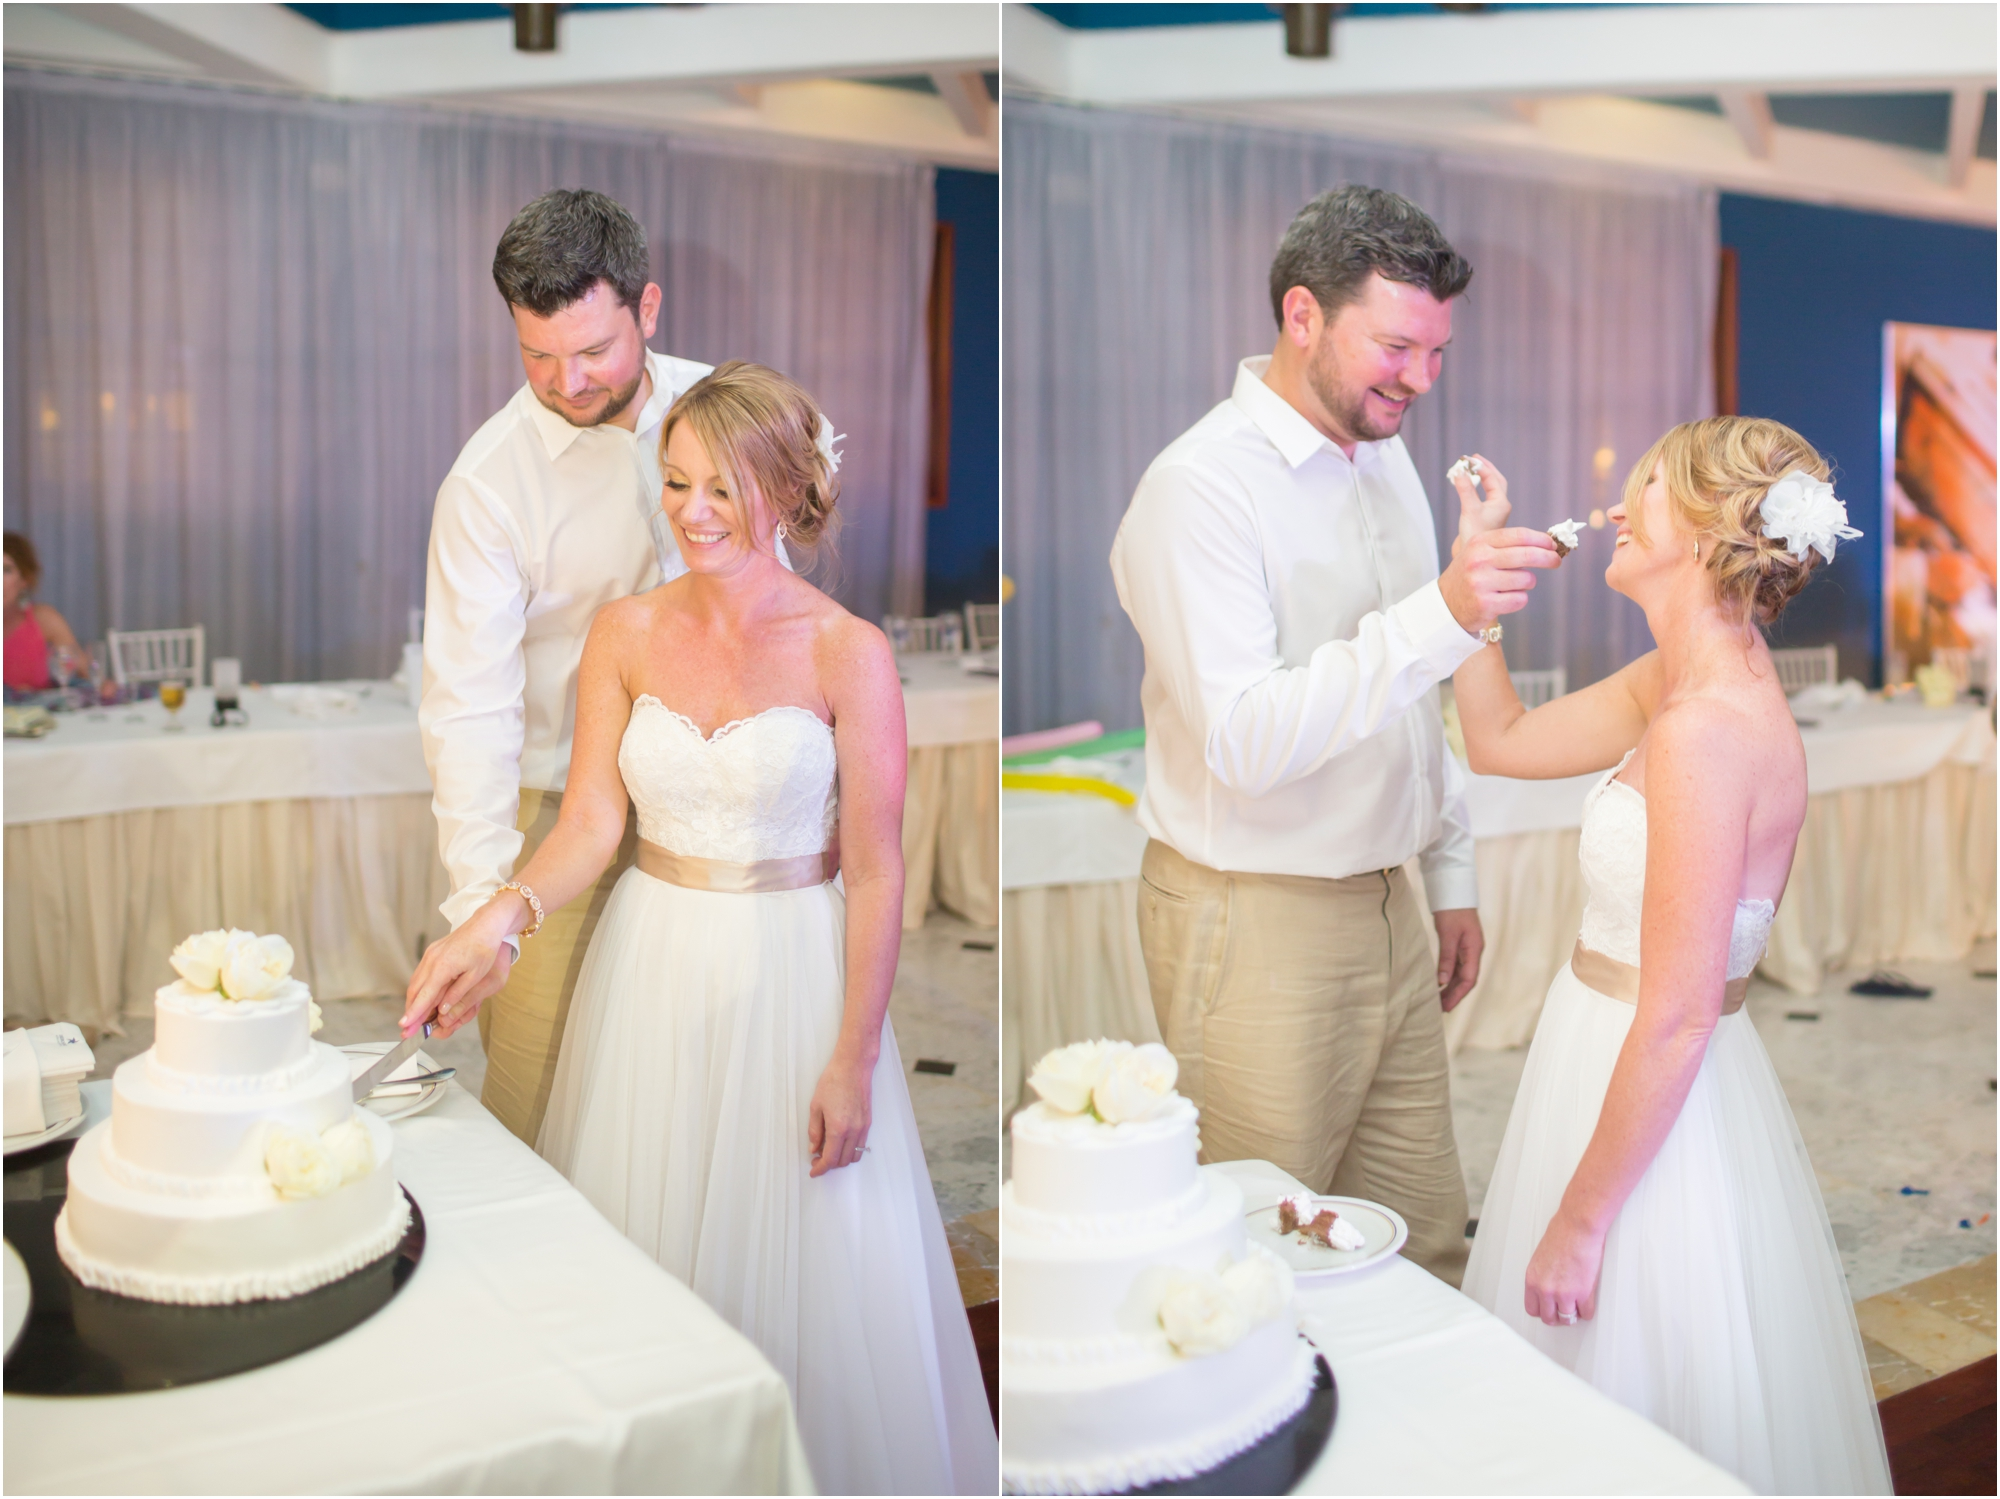 Morosoff Wedding 5-Reception-653_anna grace photography destination wedding photographer playa del carmen mexico photo.jpg